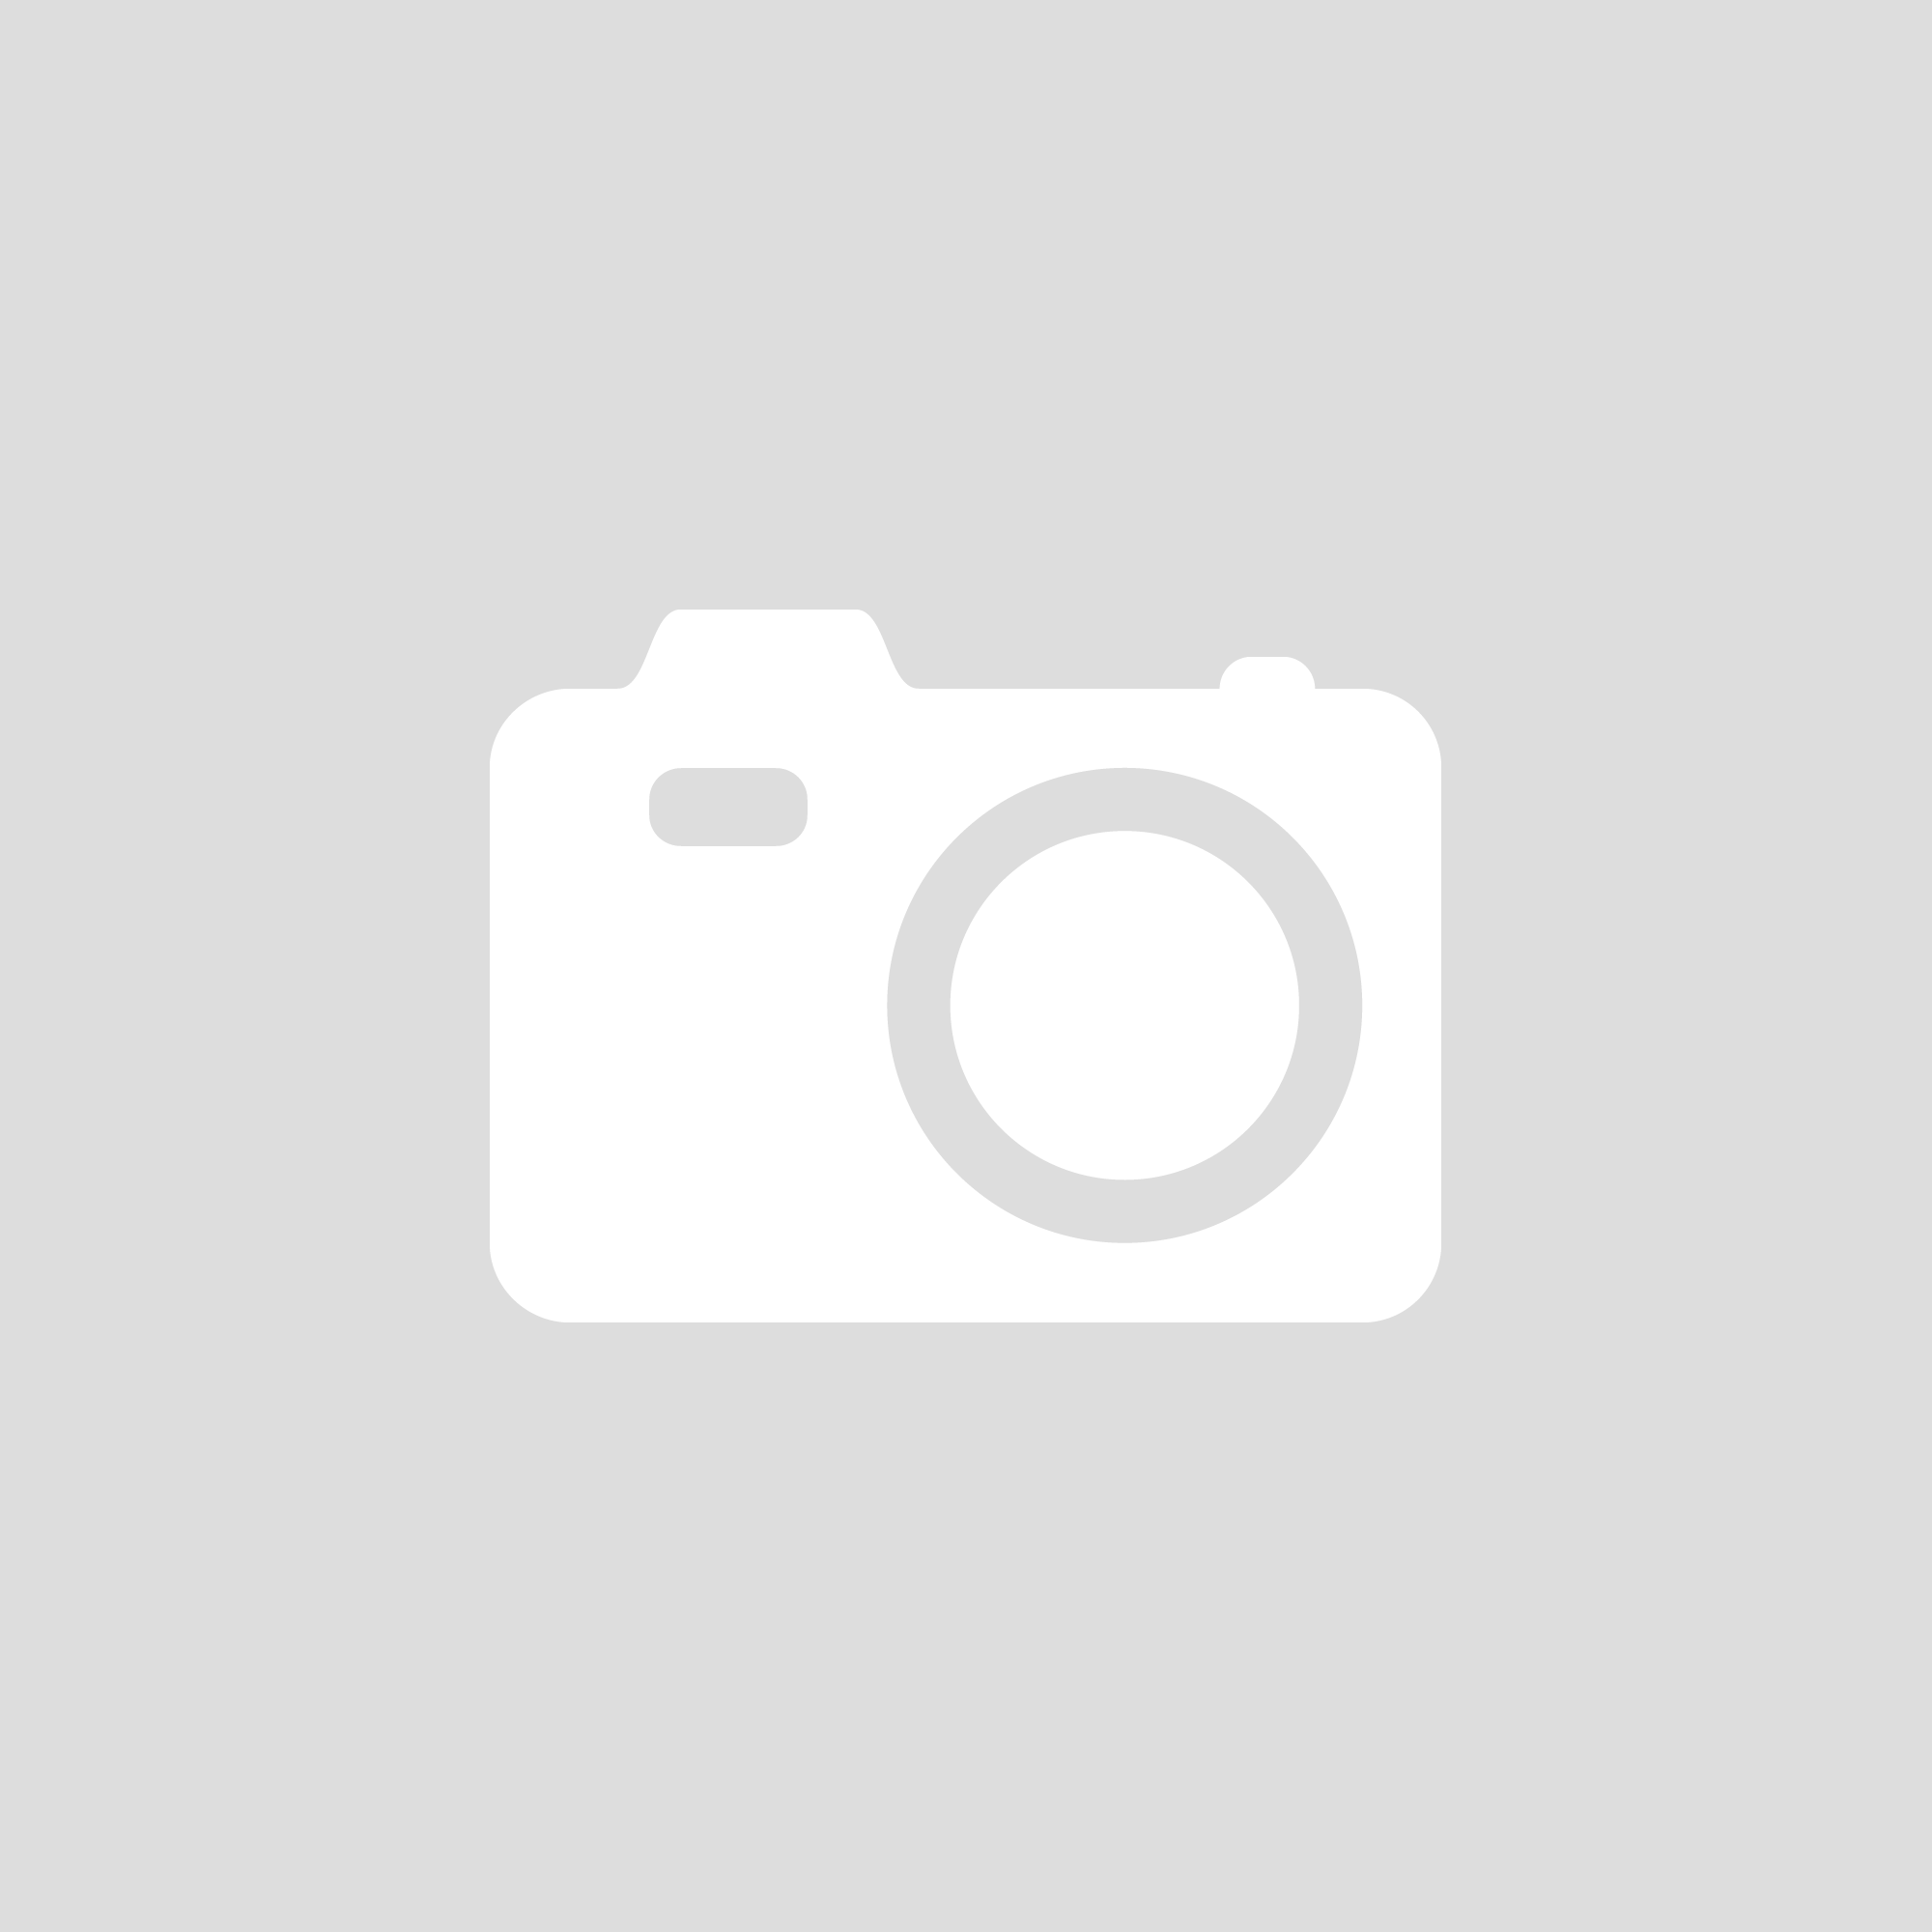 Crystal Tulip Damask Charcoal Wallpaper by Moda Black Label 240